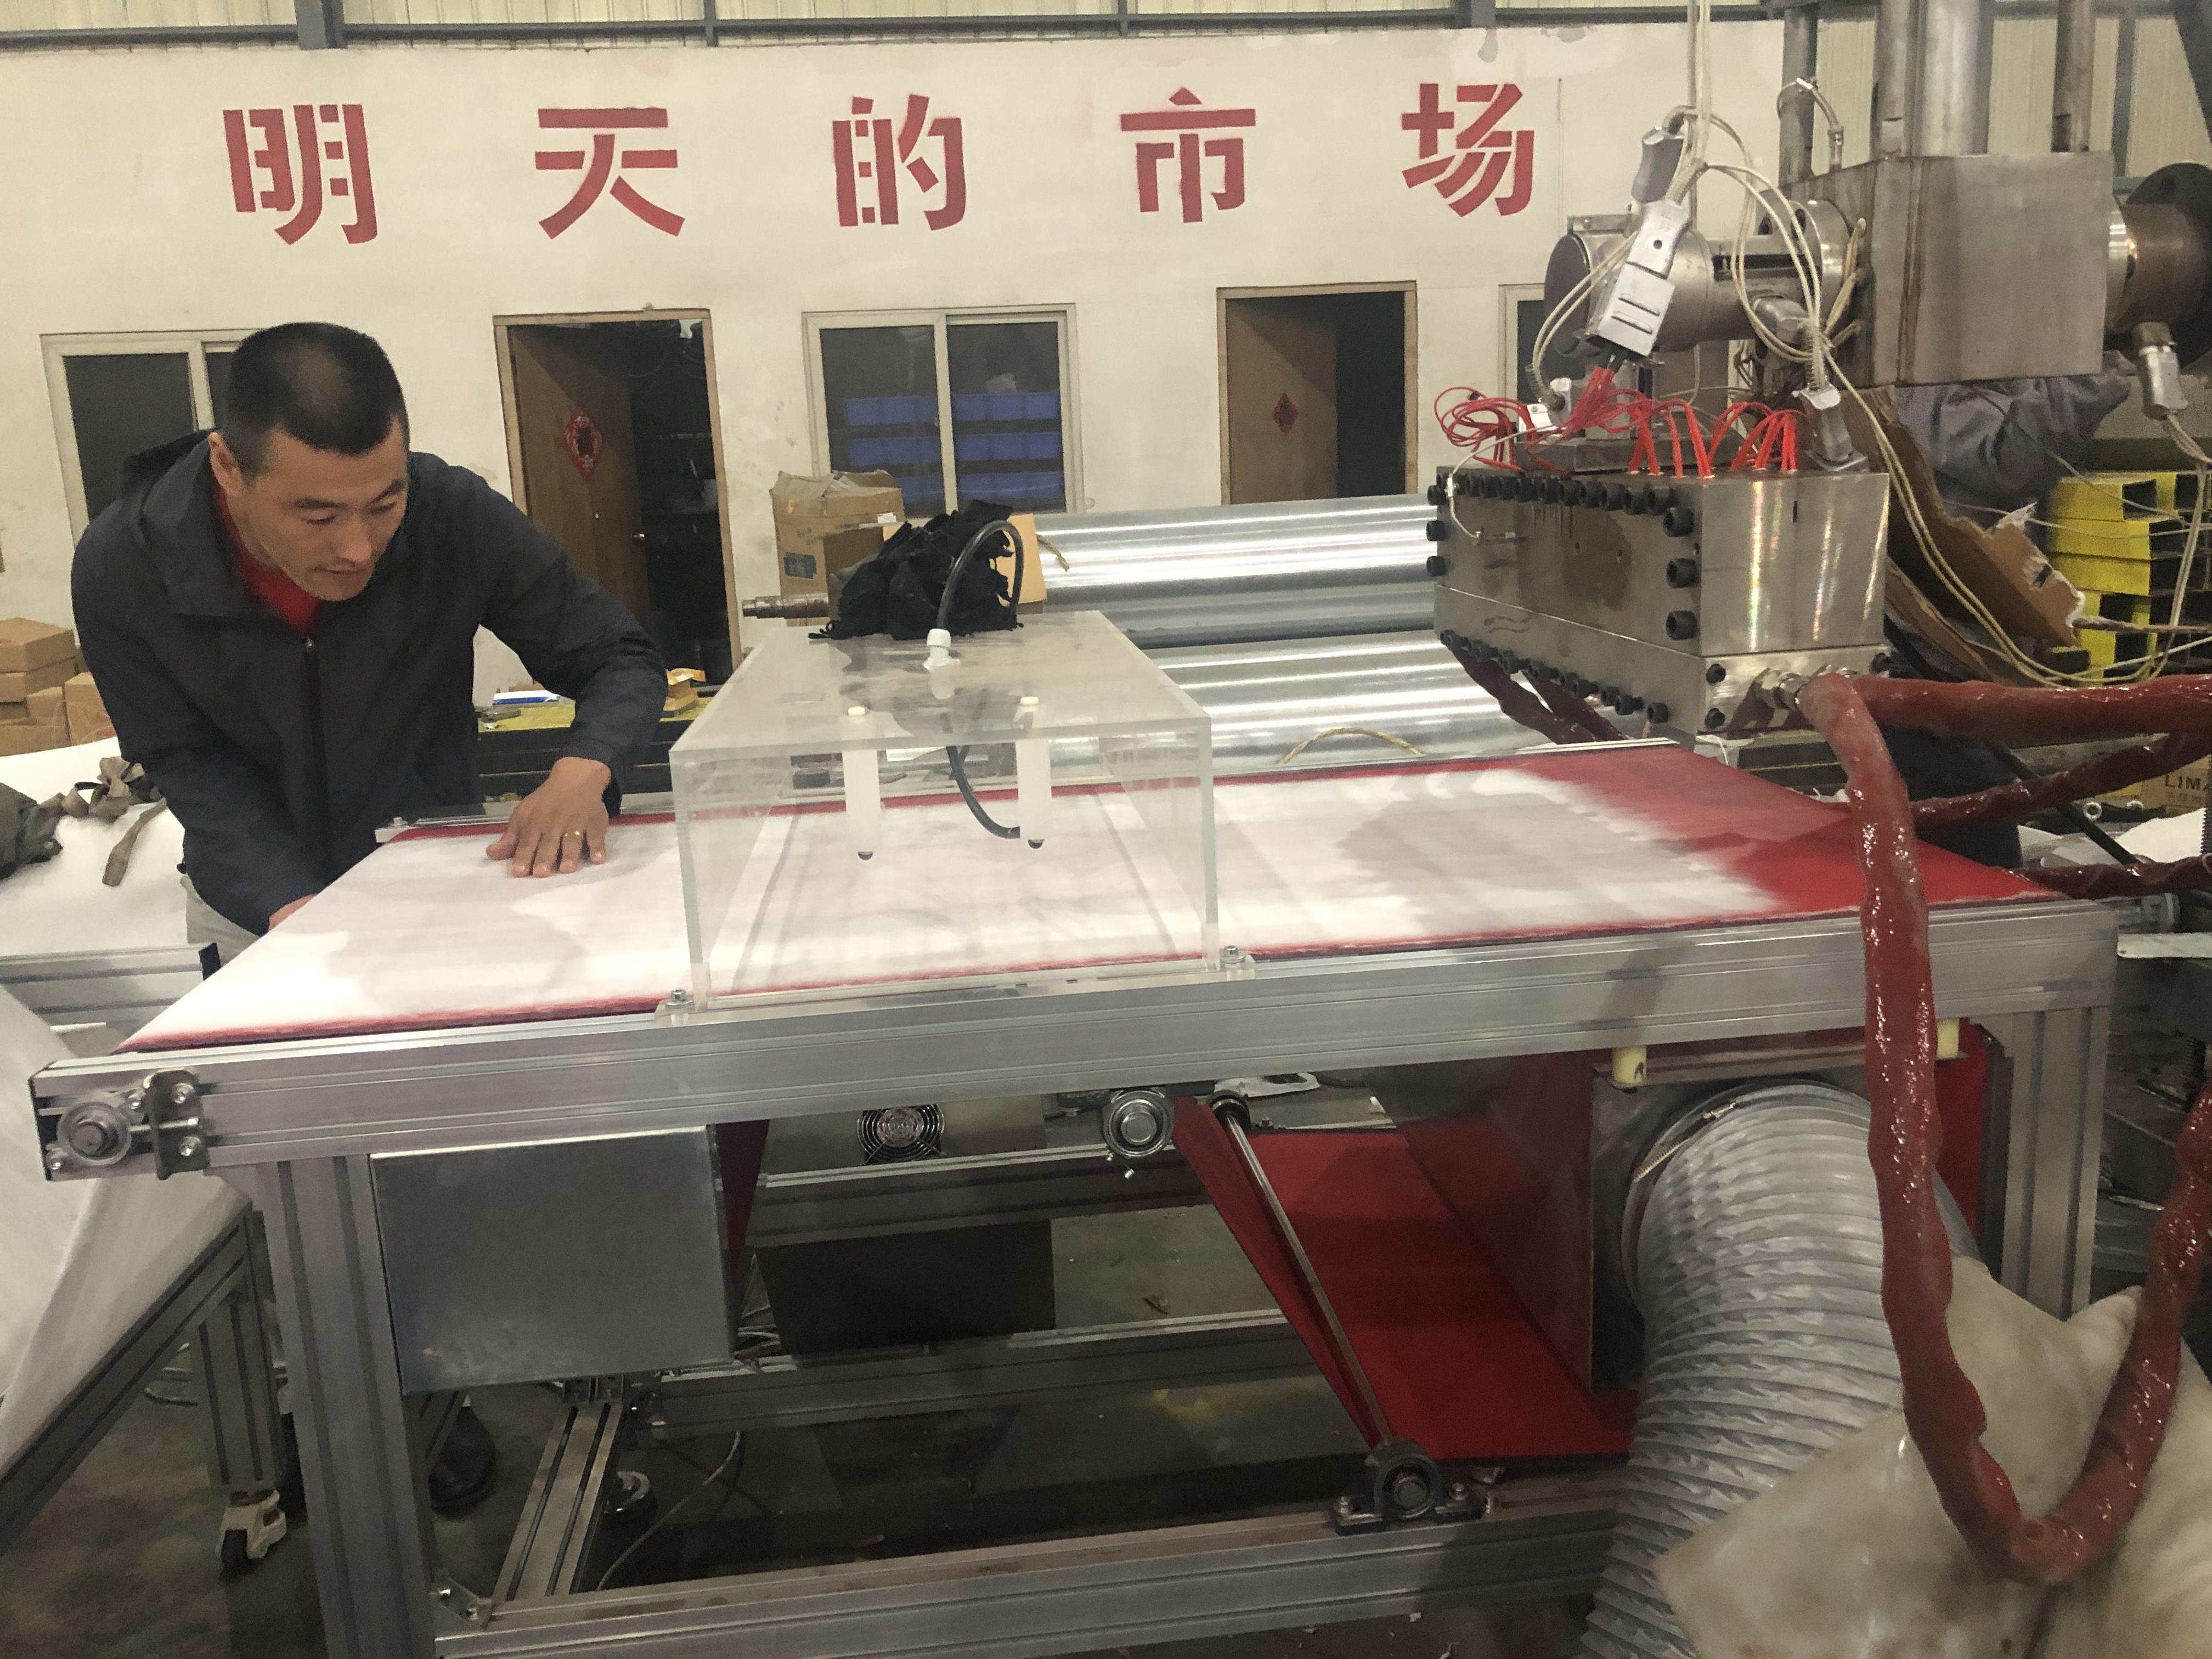 1600mm Melt Blown Non-woven Fabric Production Line